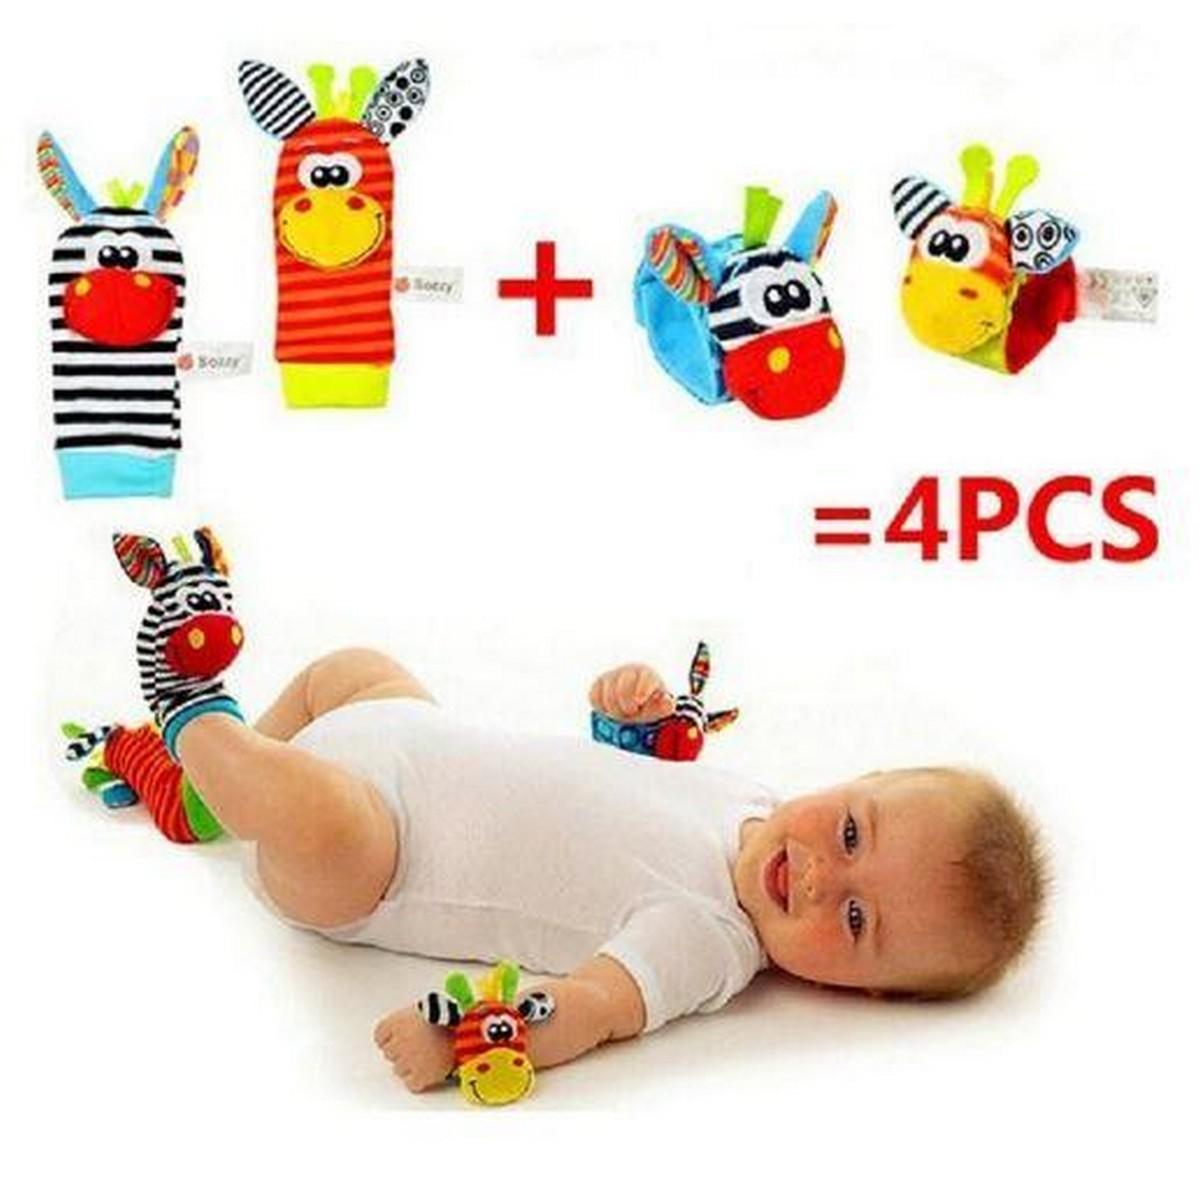 Baby Rattle Toy wrist Socks Animal Cute Cartoon Baby Socks